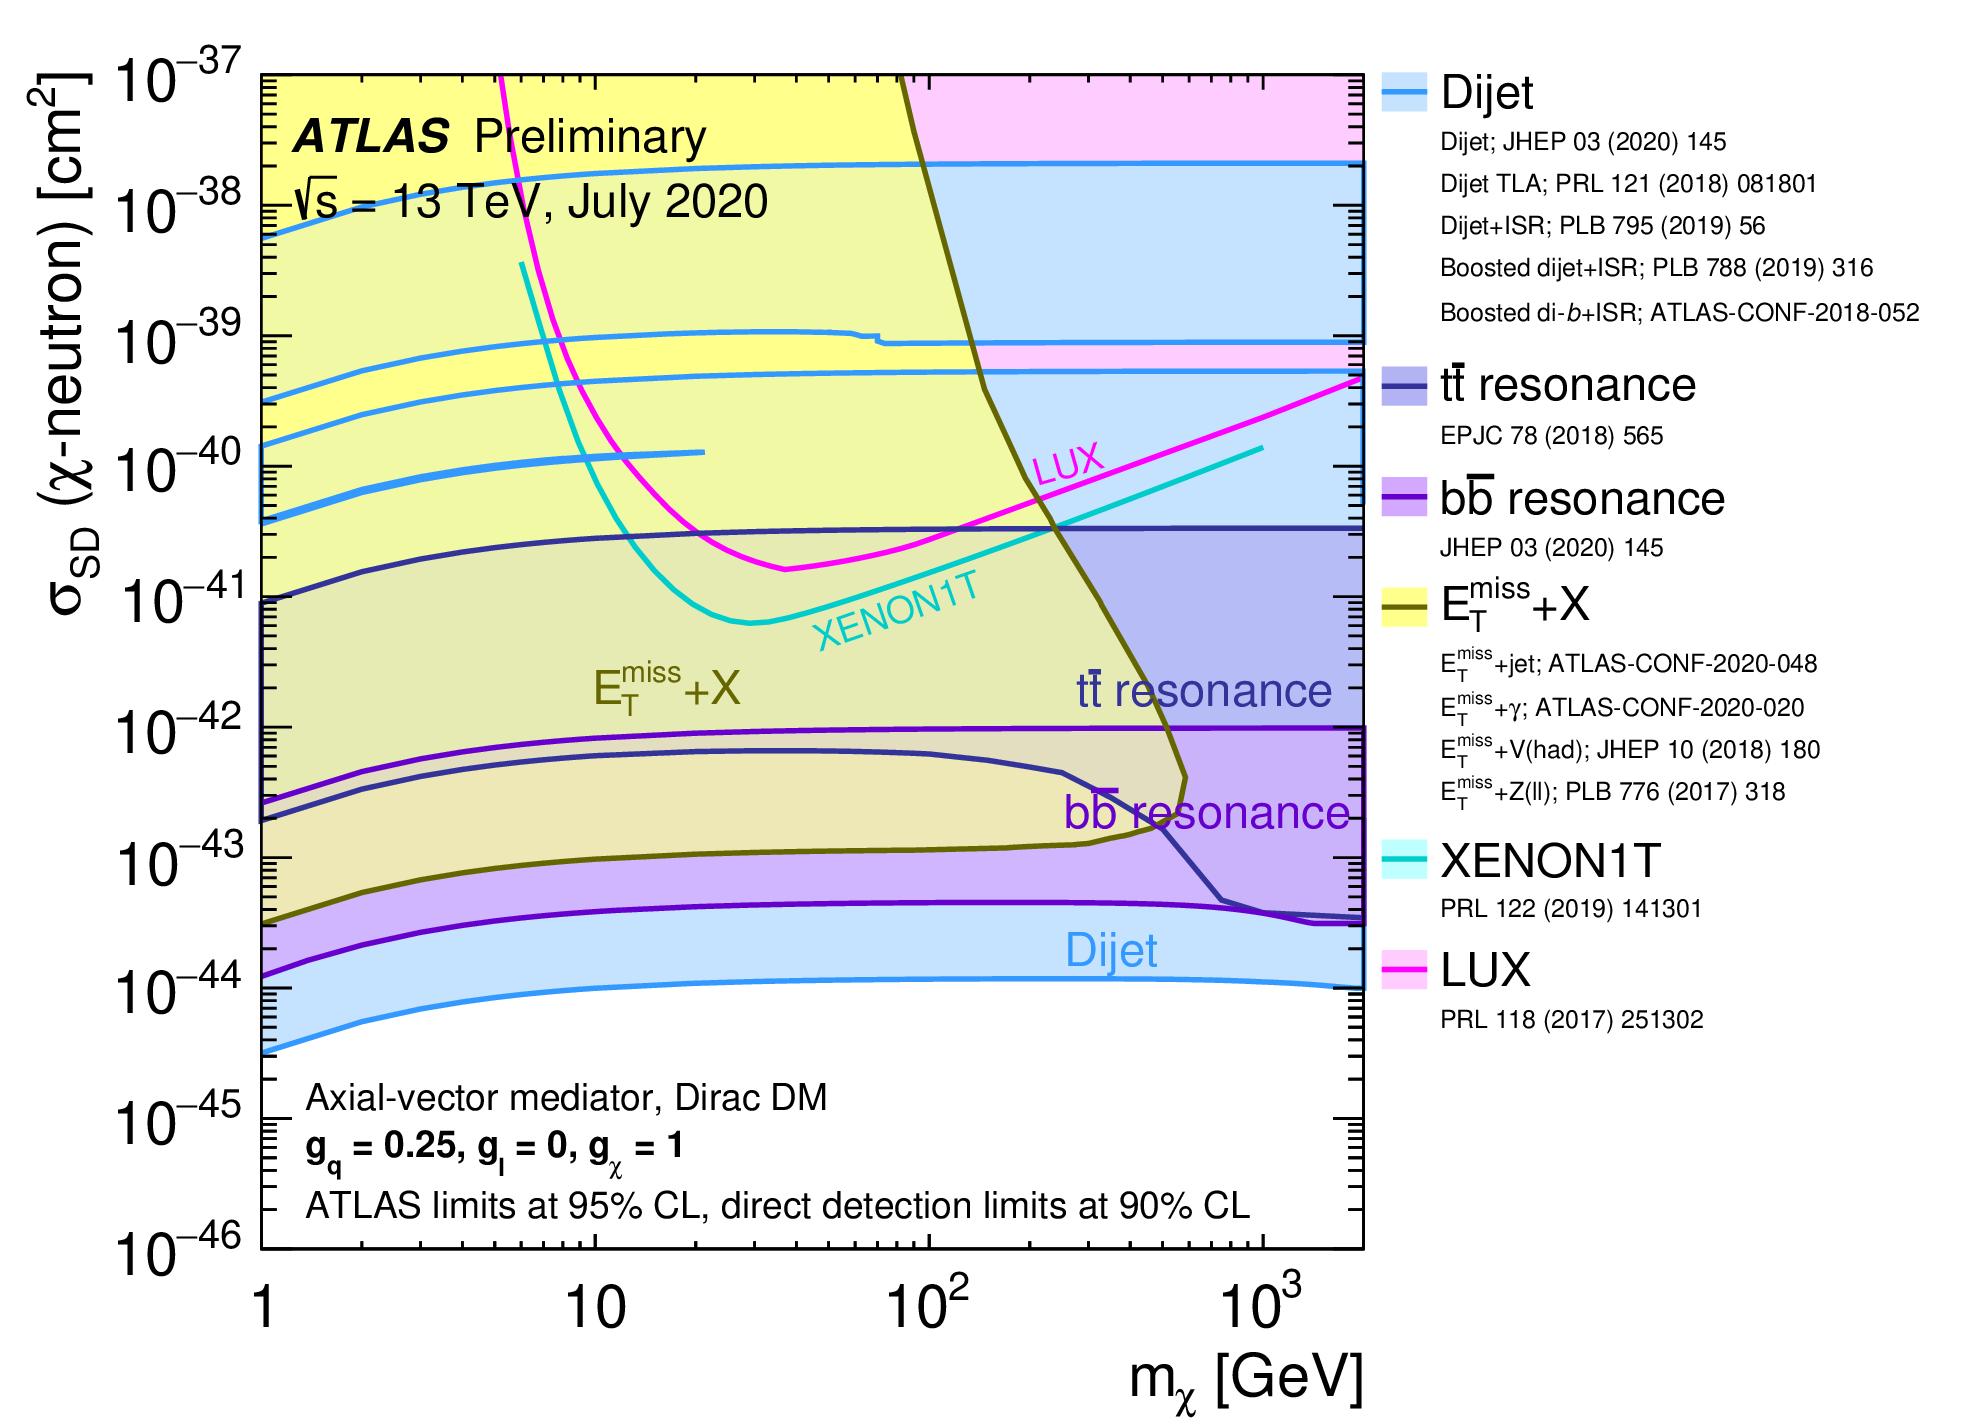 https://atlas.web.cern.ch/Atlas/GROUPS/PHYSICS/CombinedSummaryPlots/EXOTICS/ATLAS_DarkMatter_ZCrossSection_AxialNeutron/ATLAS_DarkMatter_ZCrossSection_AxialNeutron.png